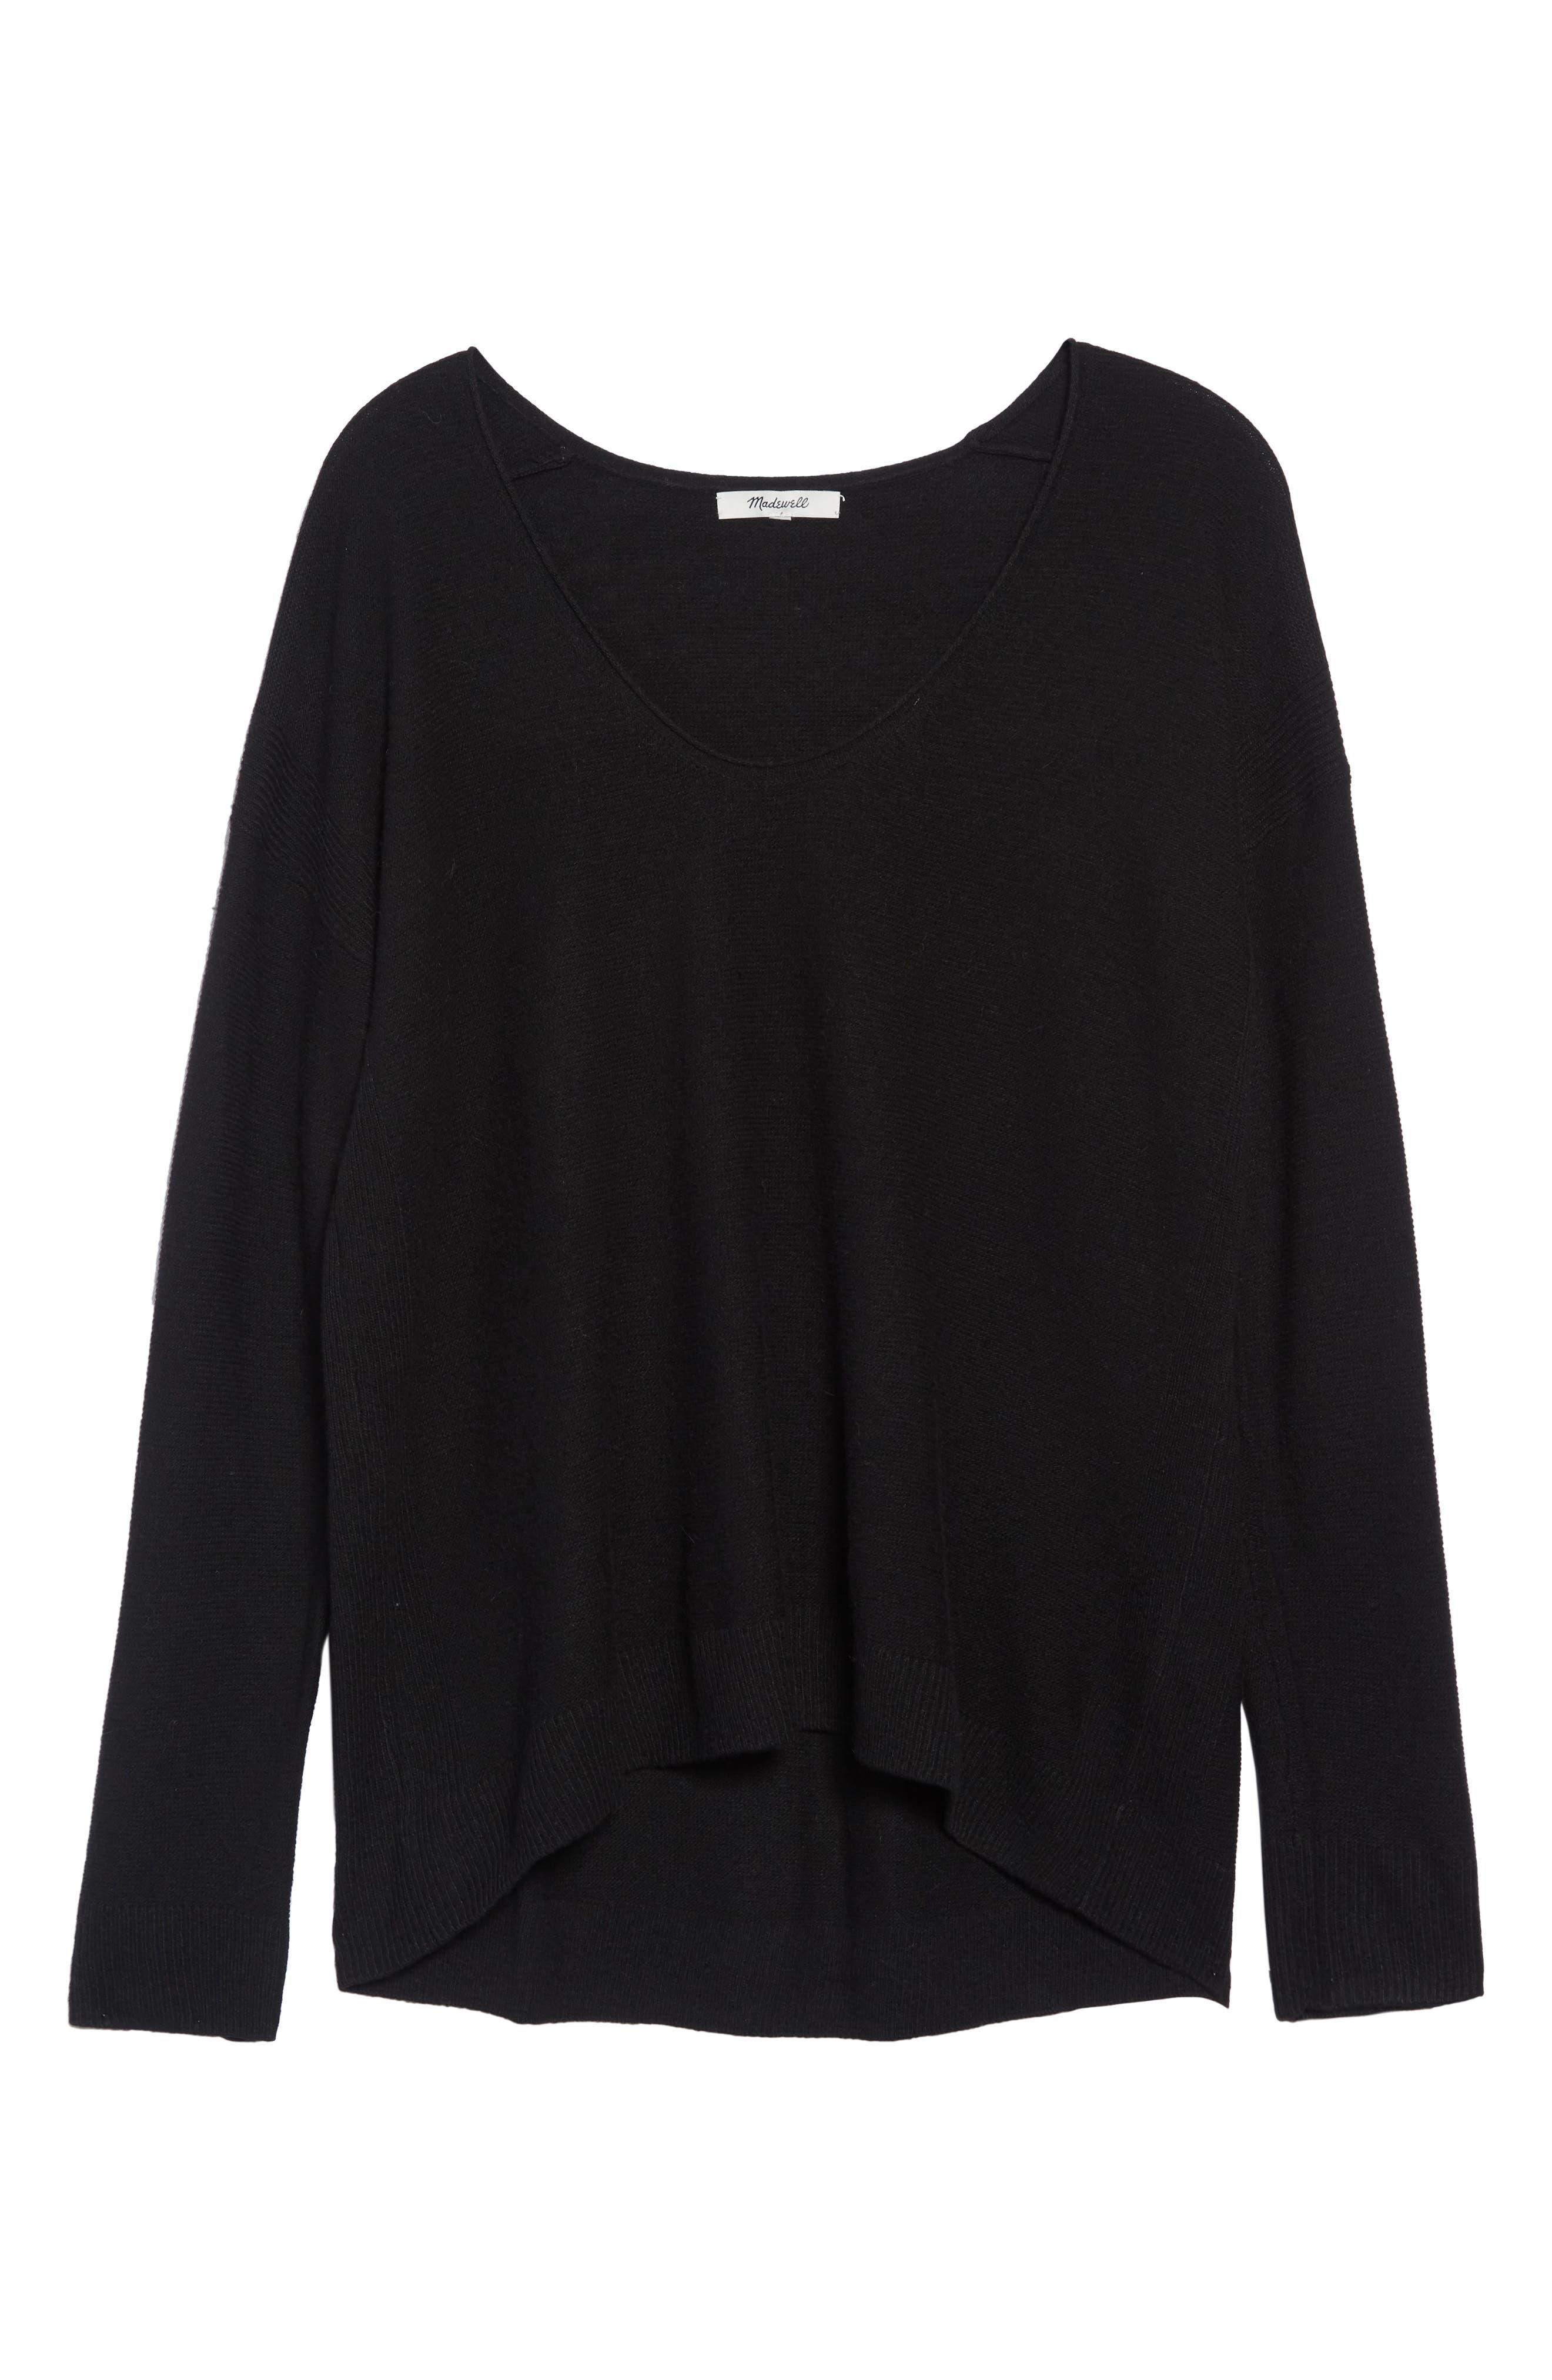 MADEWELL,                             Kimball Sweater,                             Main thumbnail 1, color,                             TRUE BLACK